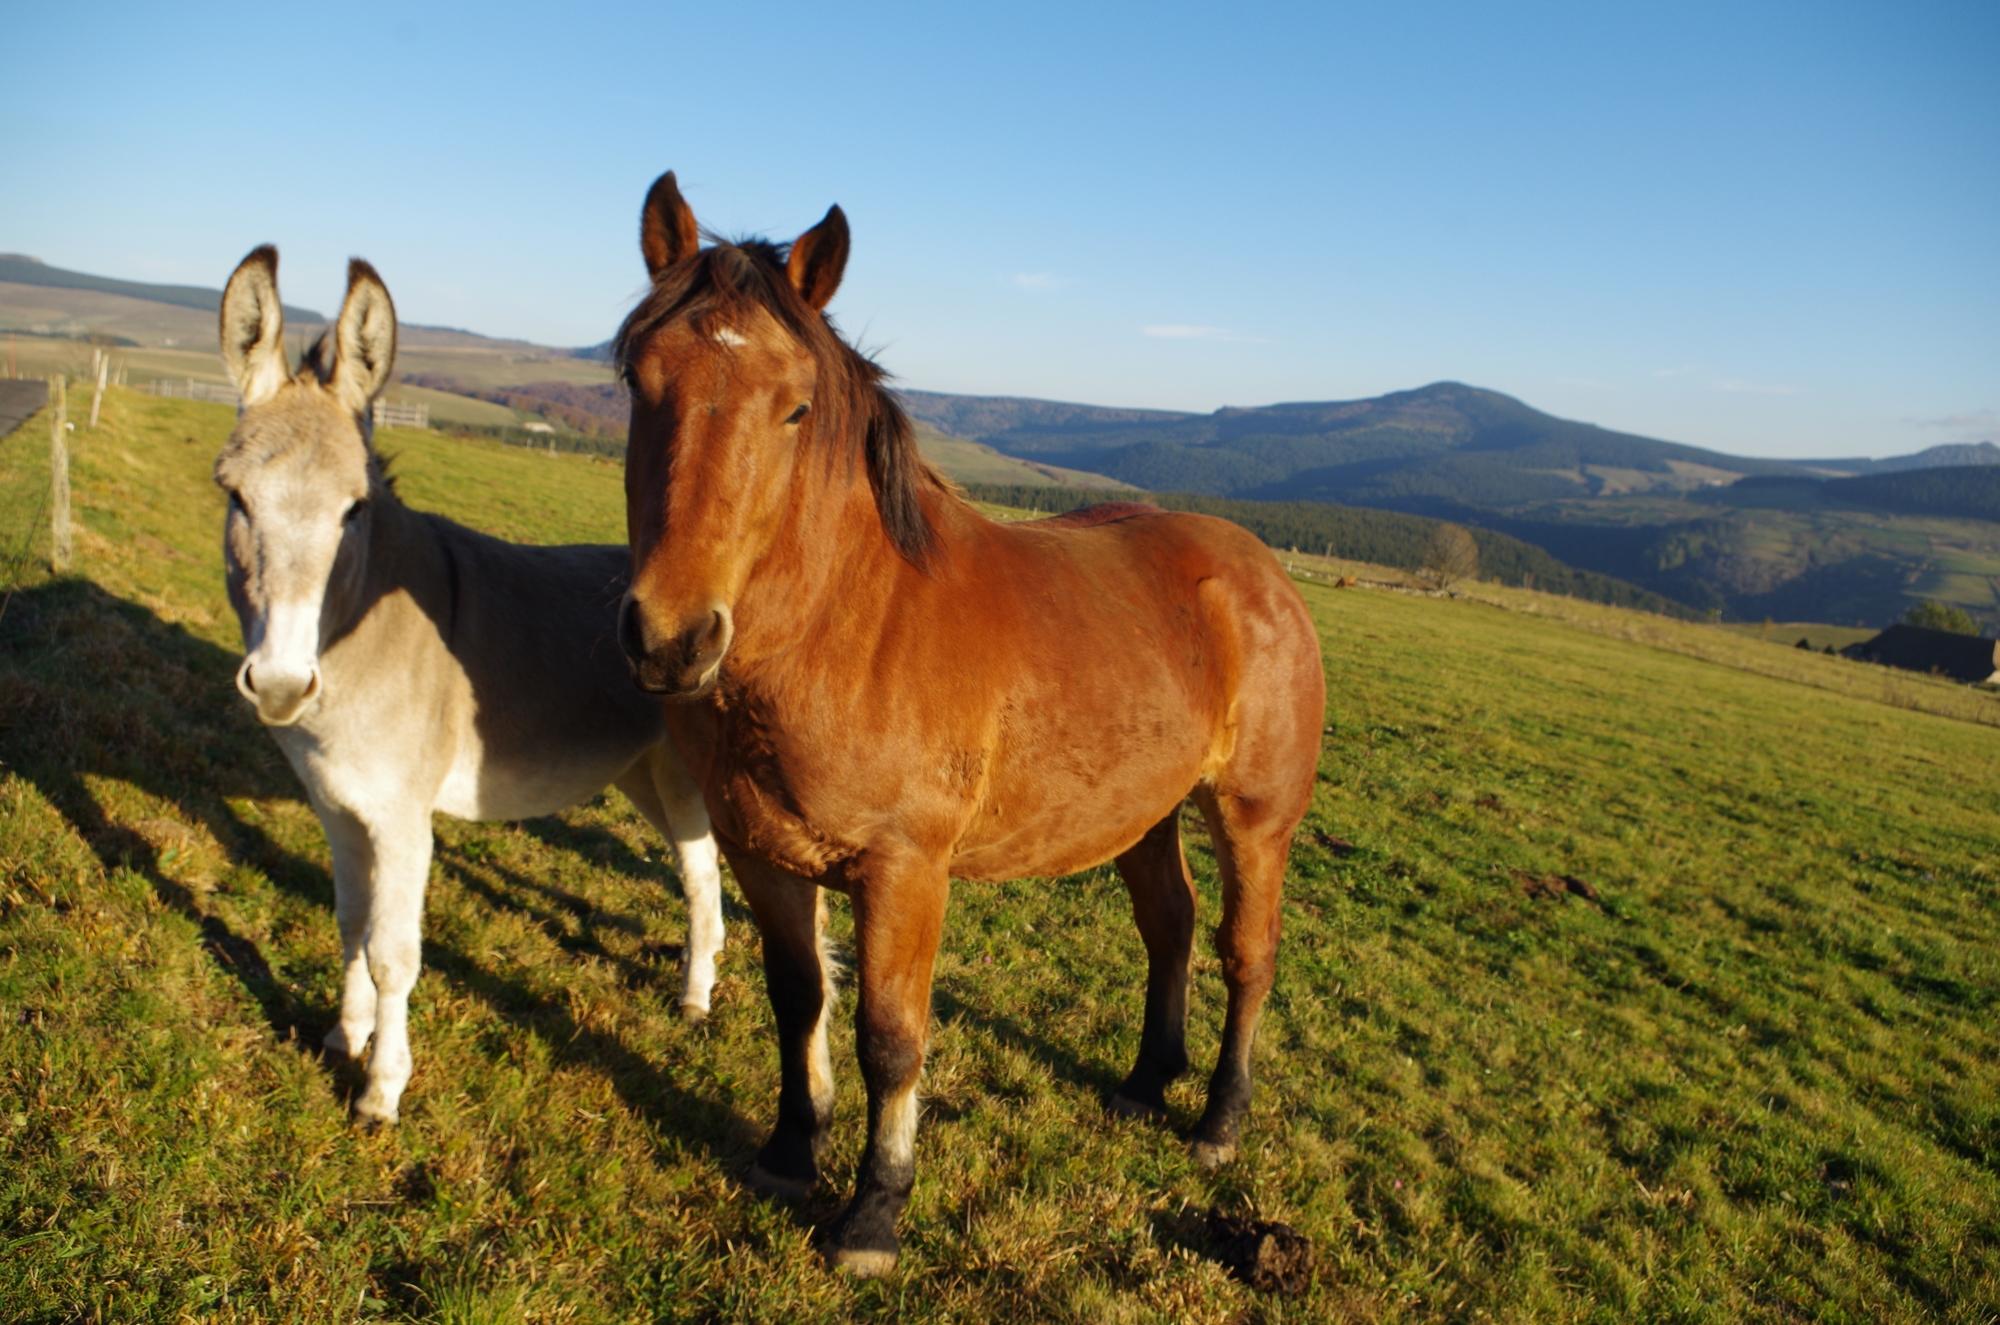 Cheval et âne